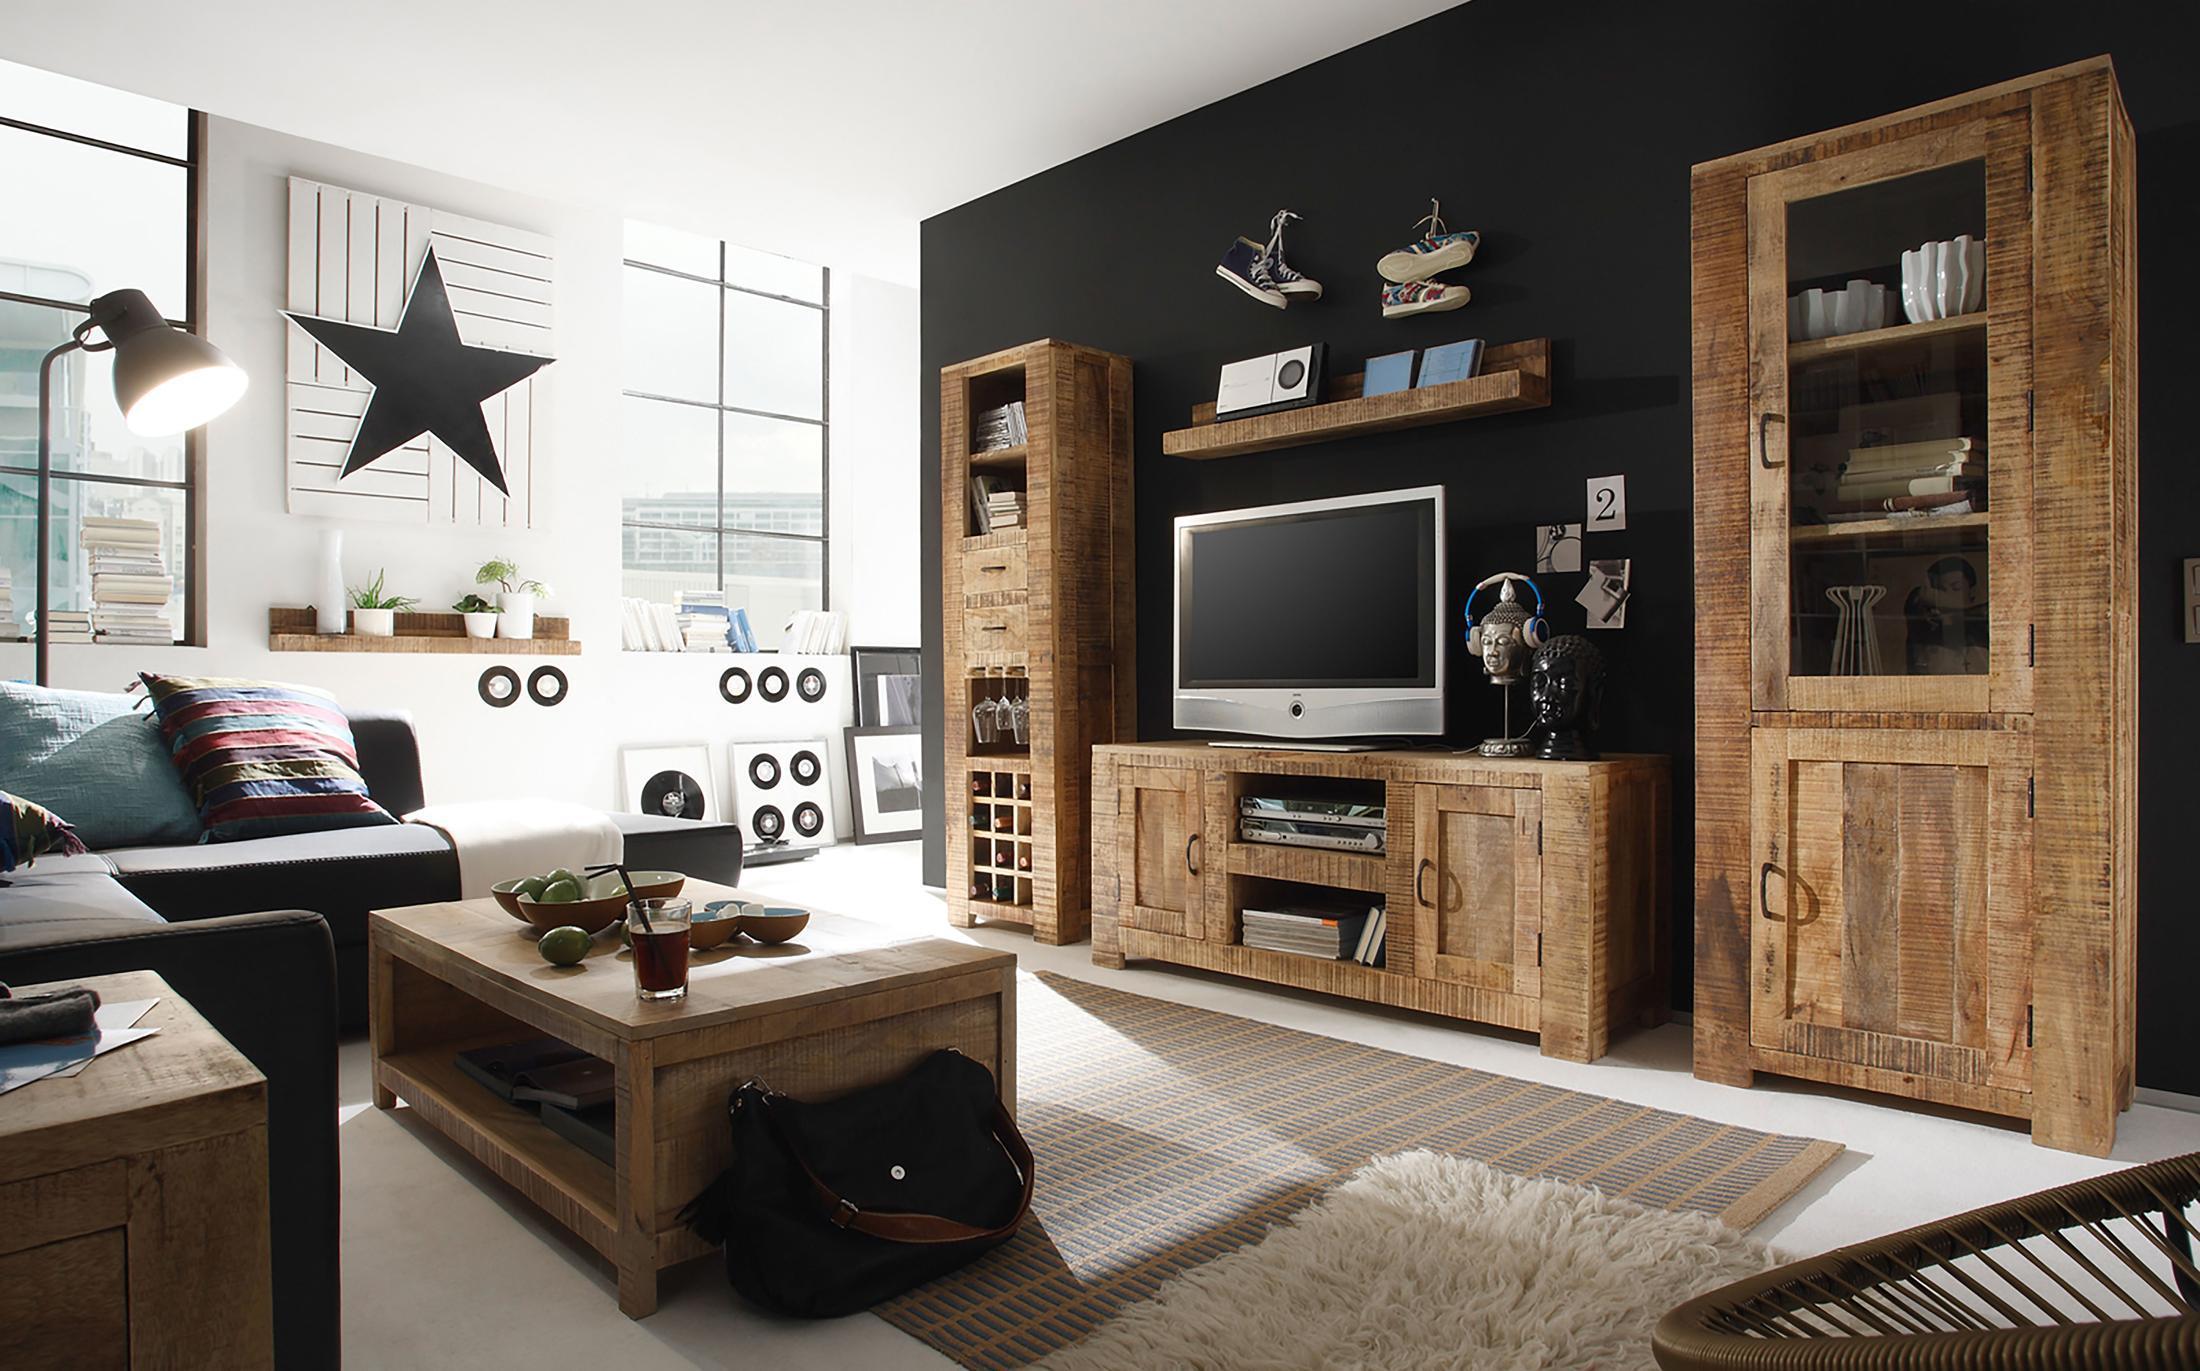 stuckleiste bilder ideen couchstyle. Black Bedroom Furniture Sets. Home Design Ideas